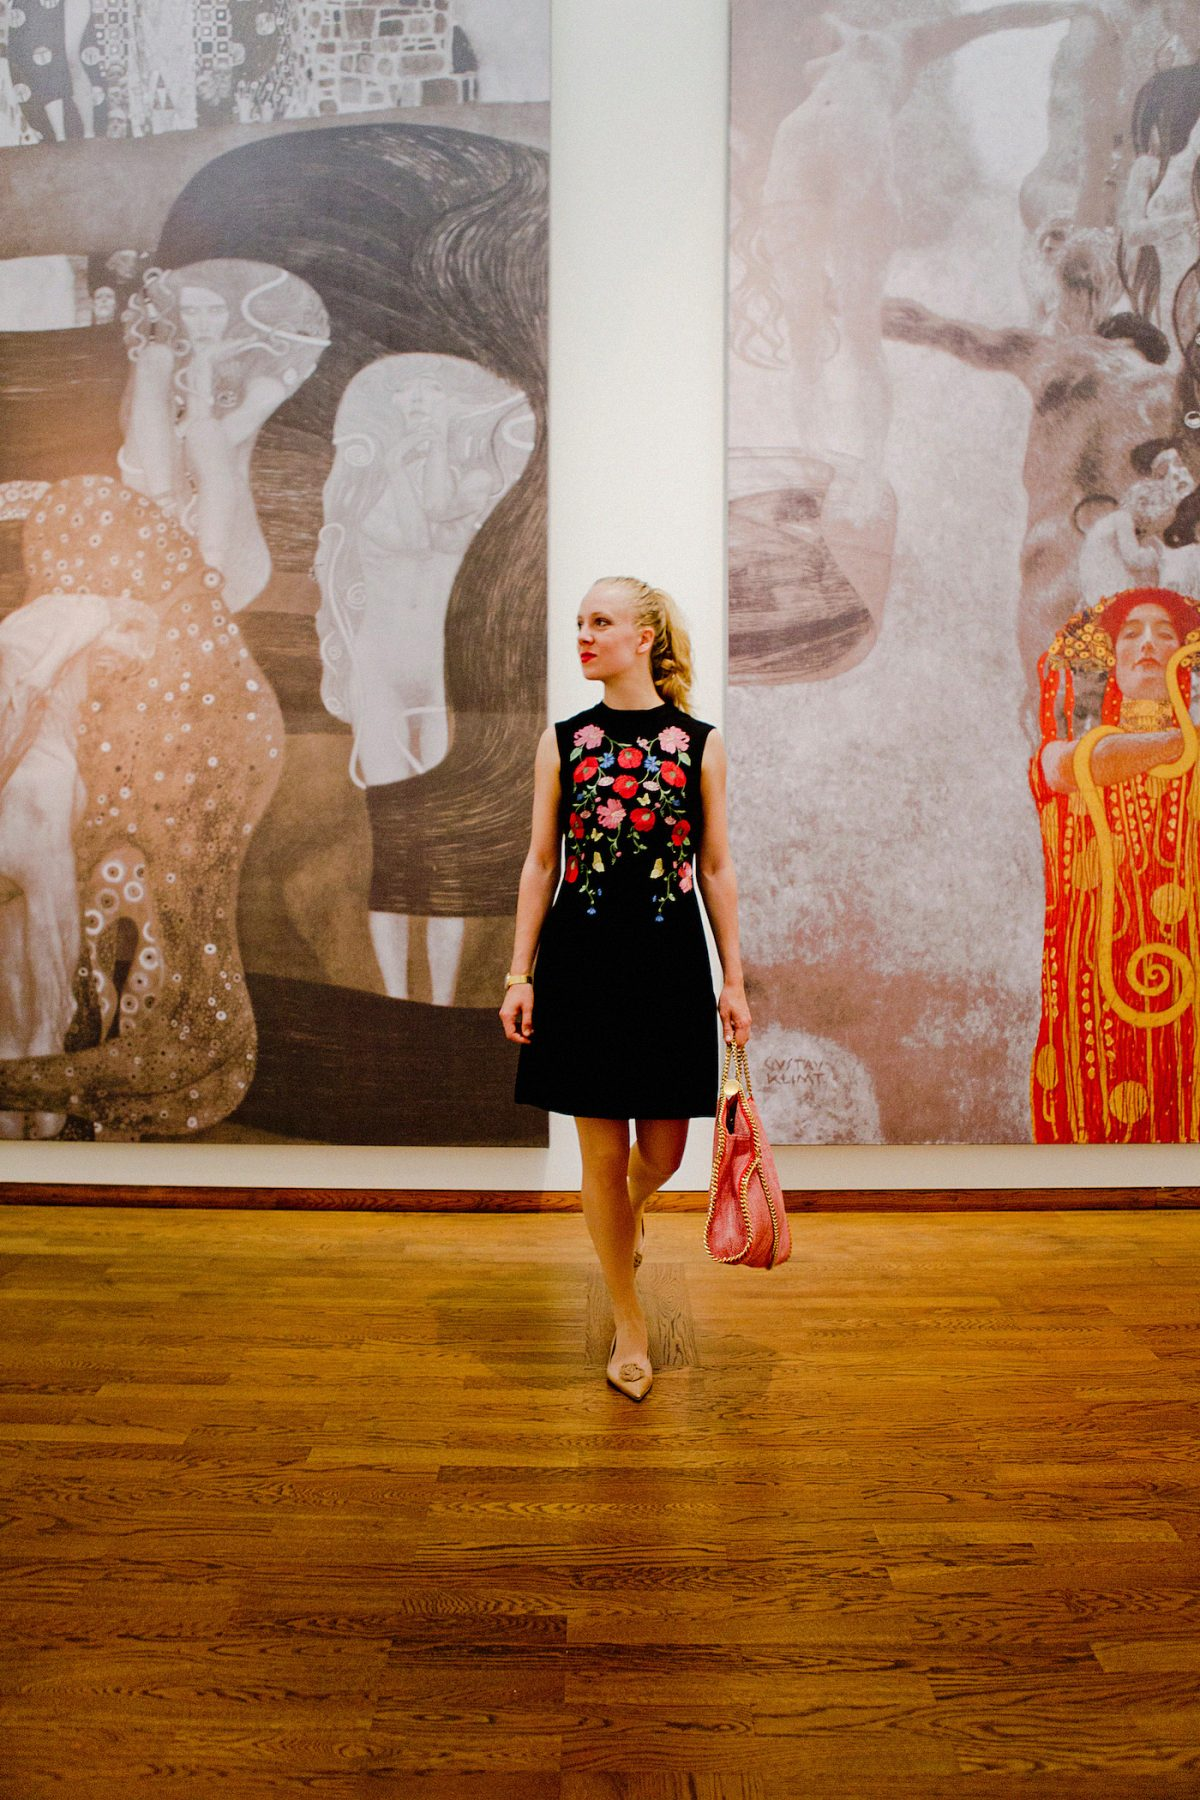 www.thegoldenbun.com |MuseumsQuartier Wien, MQ Wien, Mumok, Leopold Museum